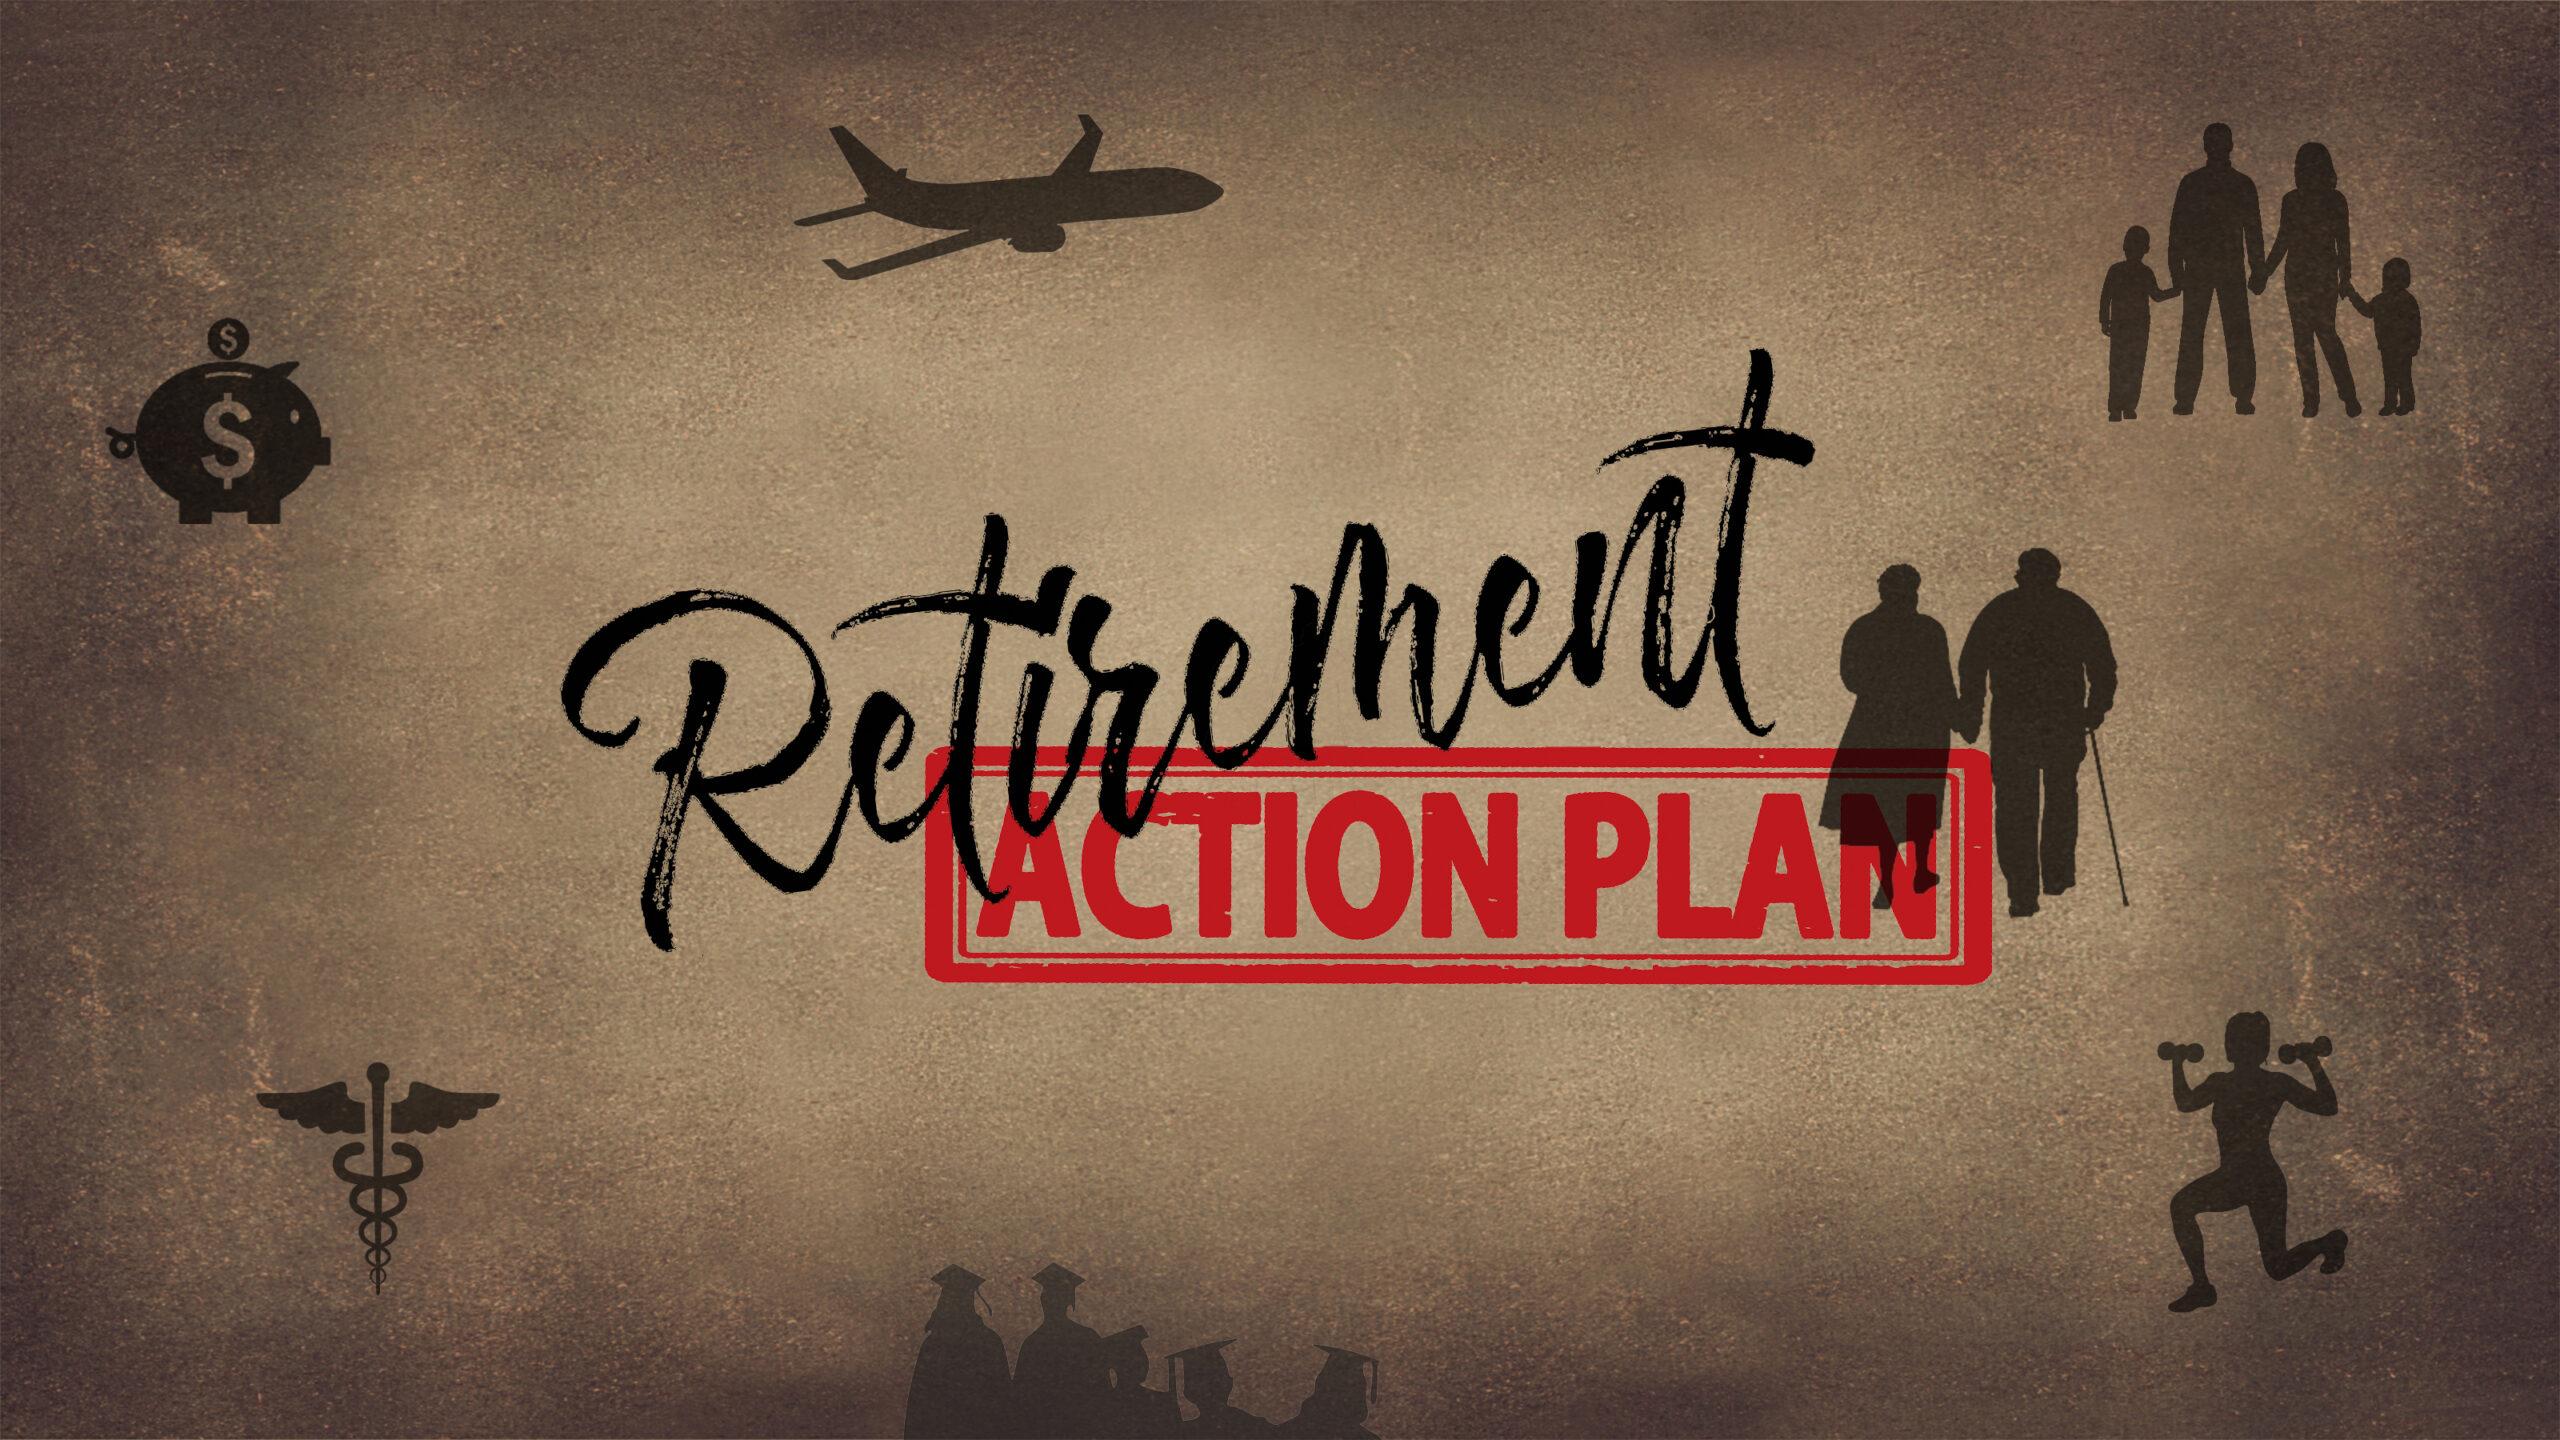 Episode 06 Retirement Planning